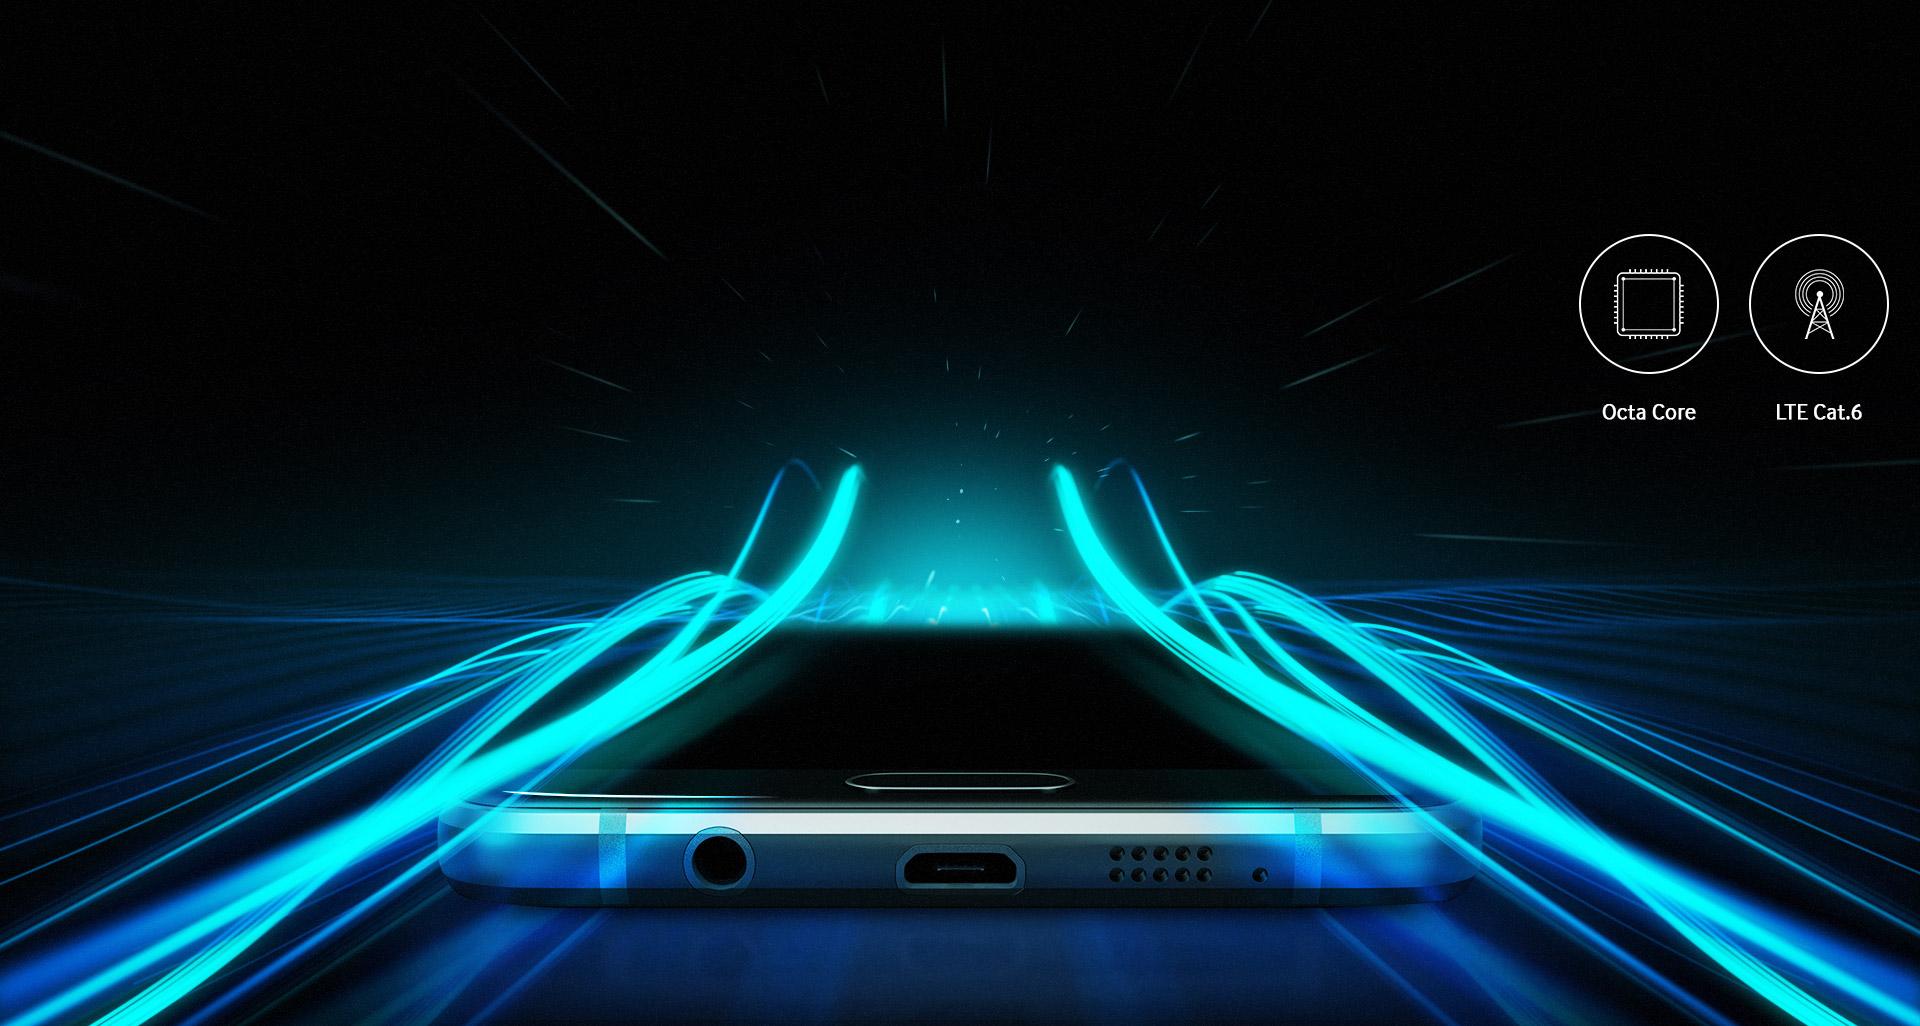 Výkon nového Samsung Galaxy A5 2016 si opravdu zamilujete.